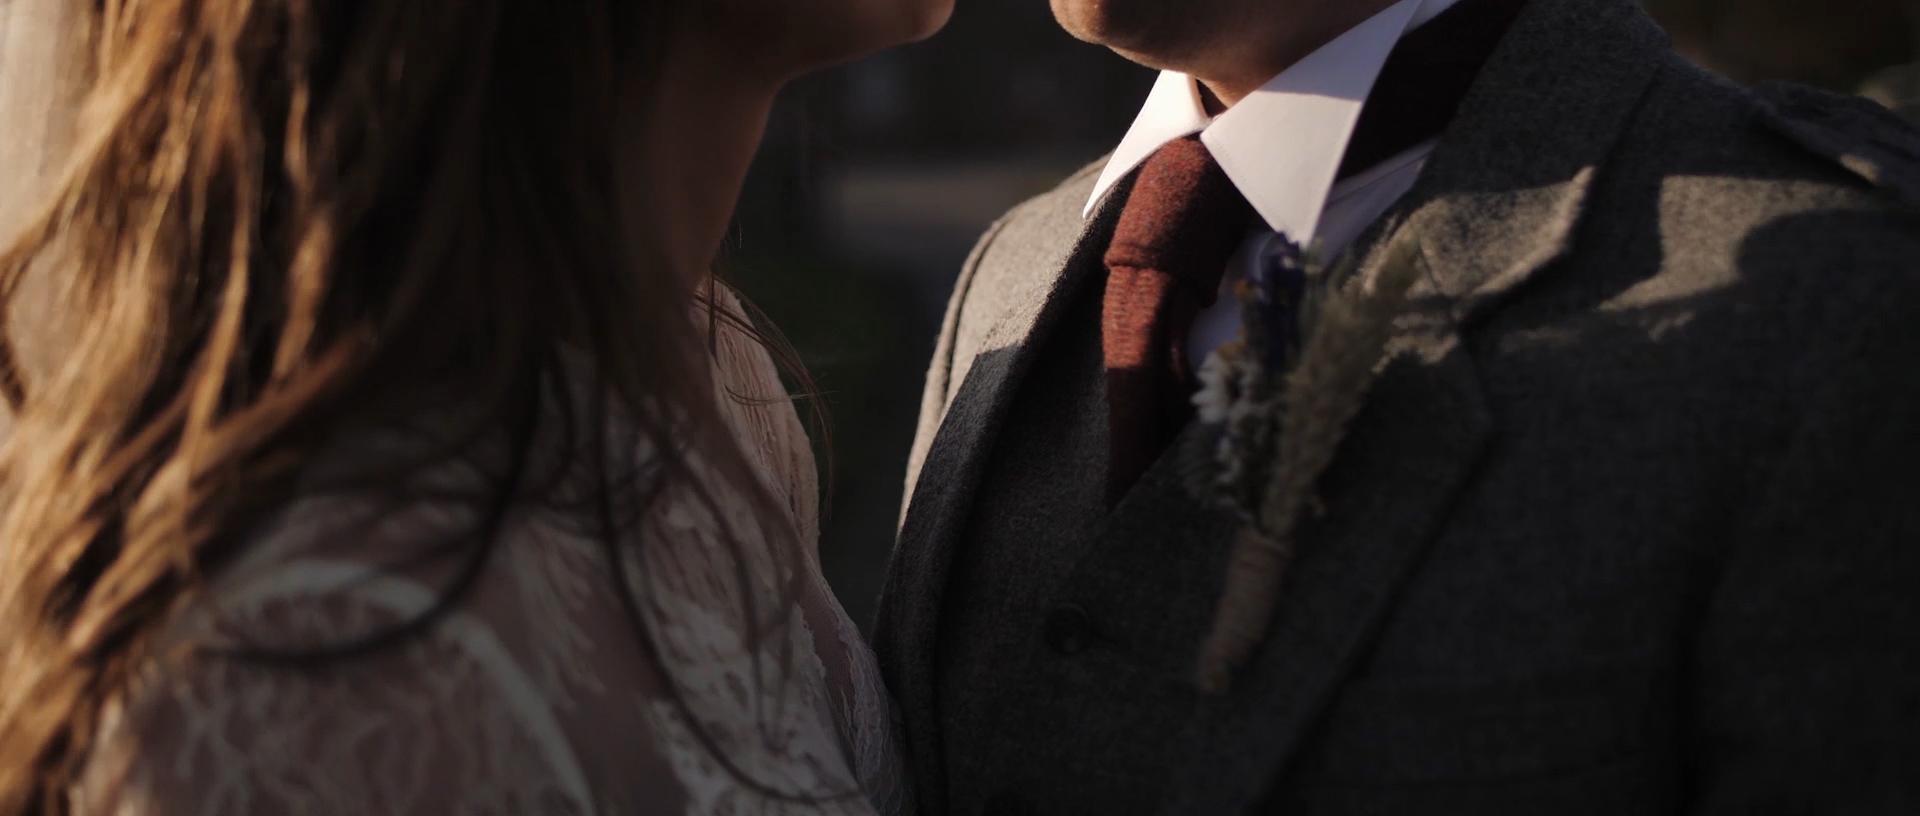 west-on-the-green-wedding-videographer_LL_04.jpg